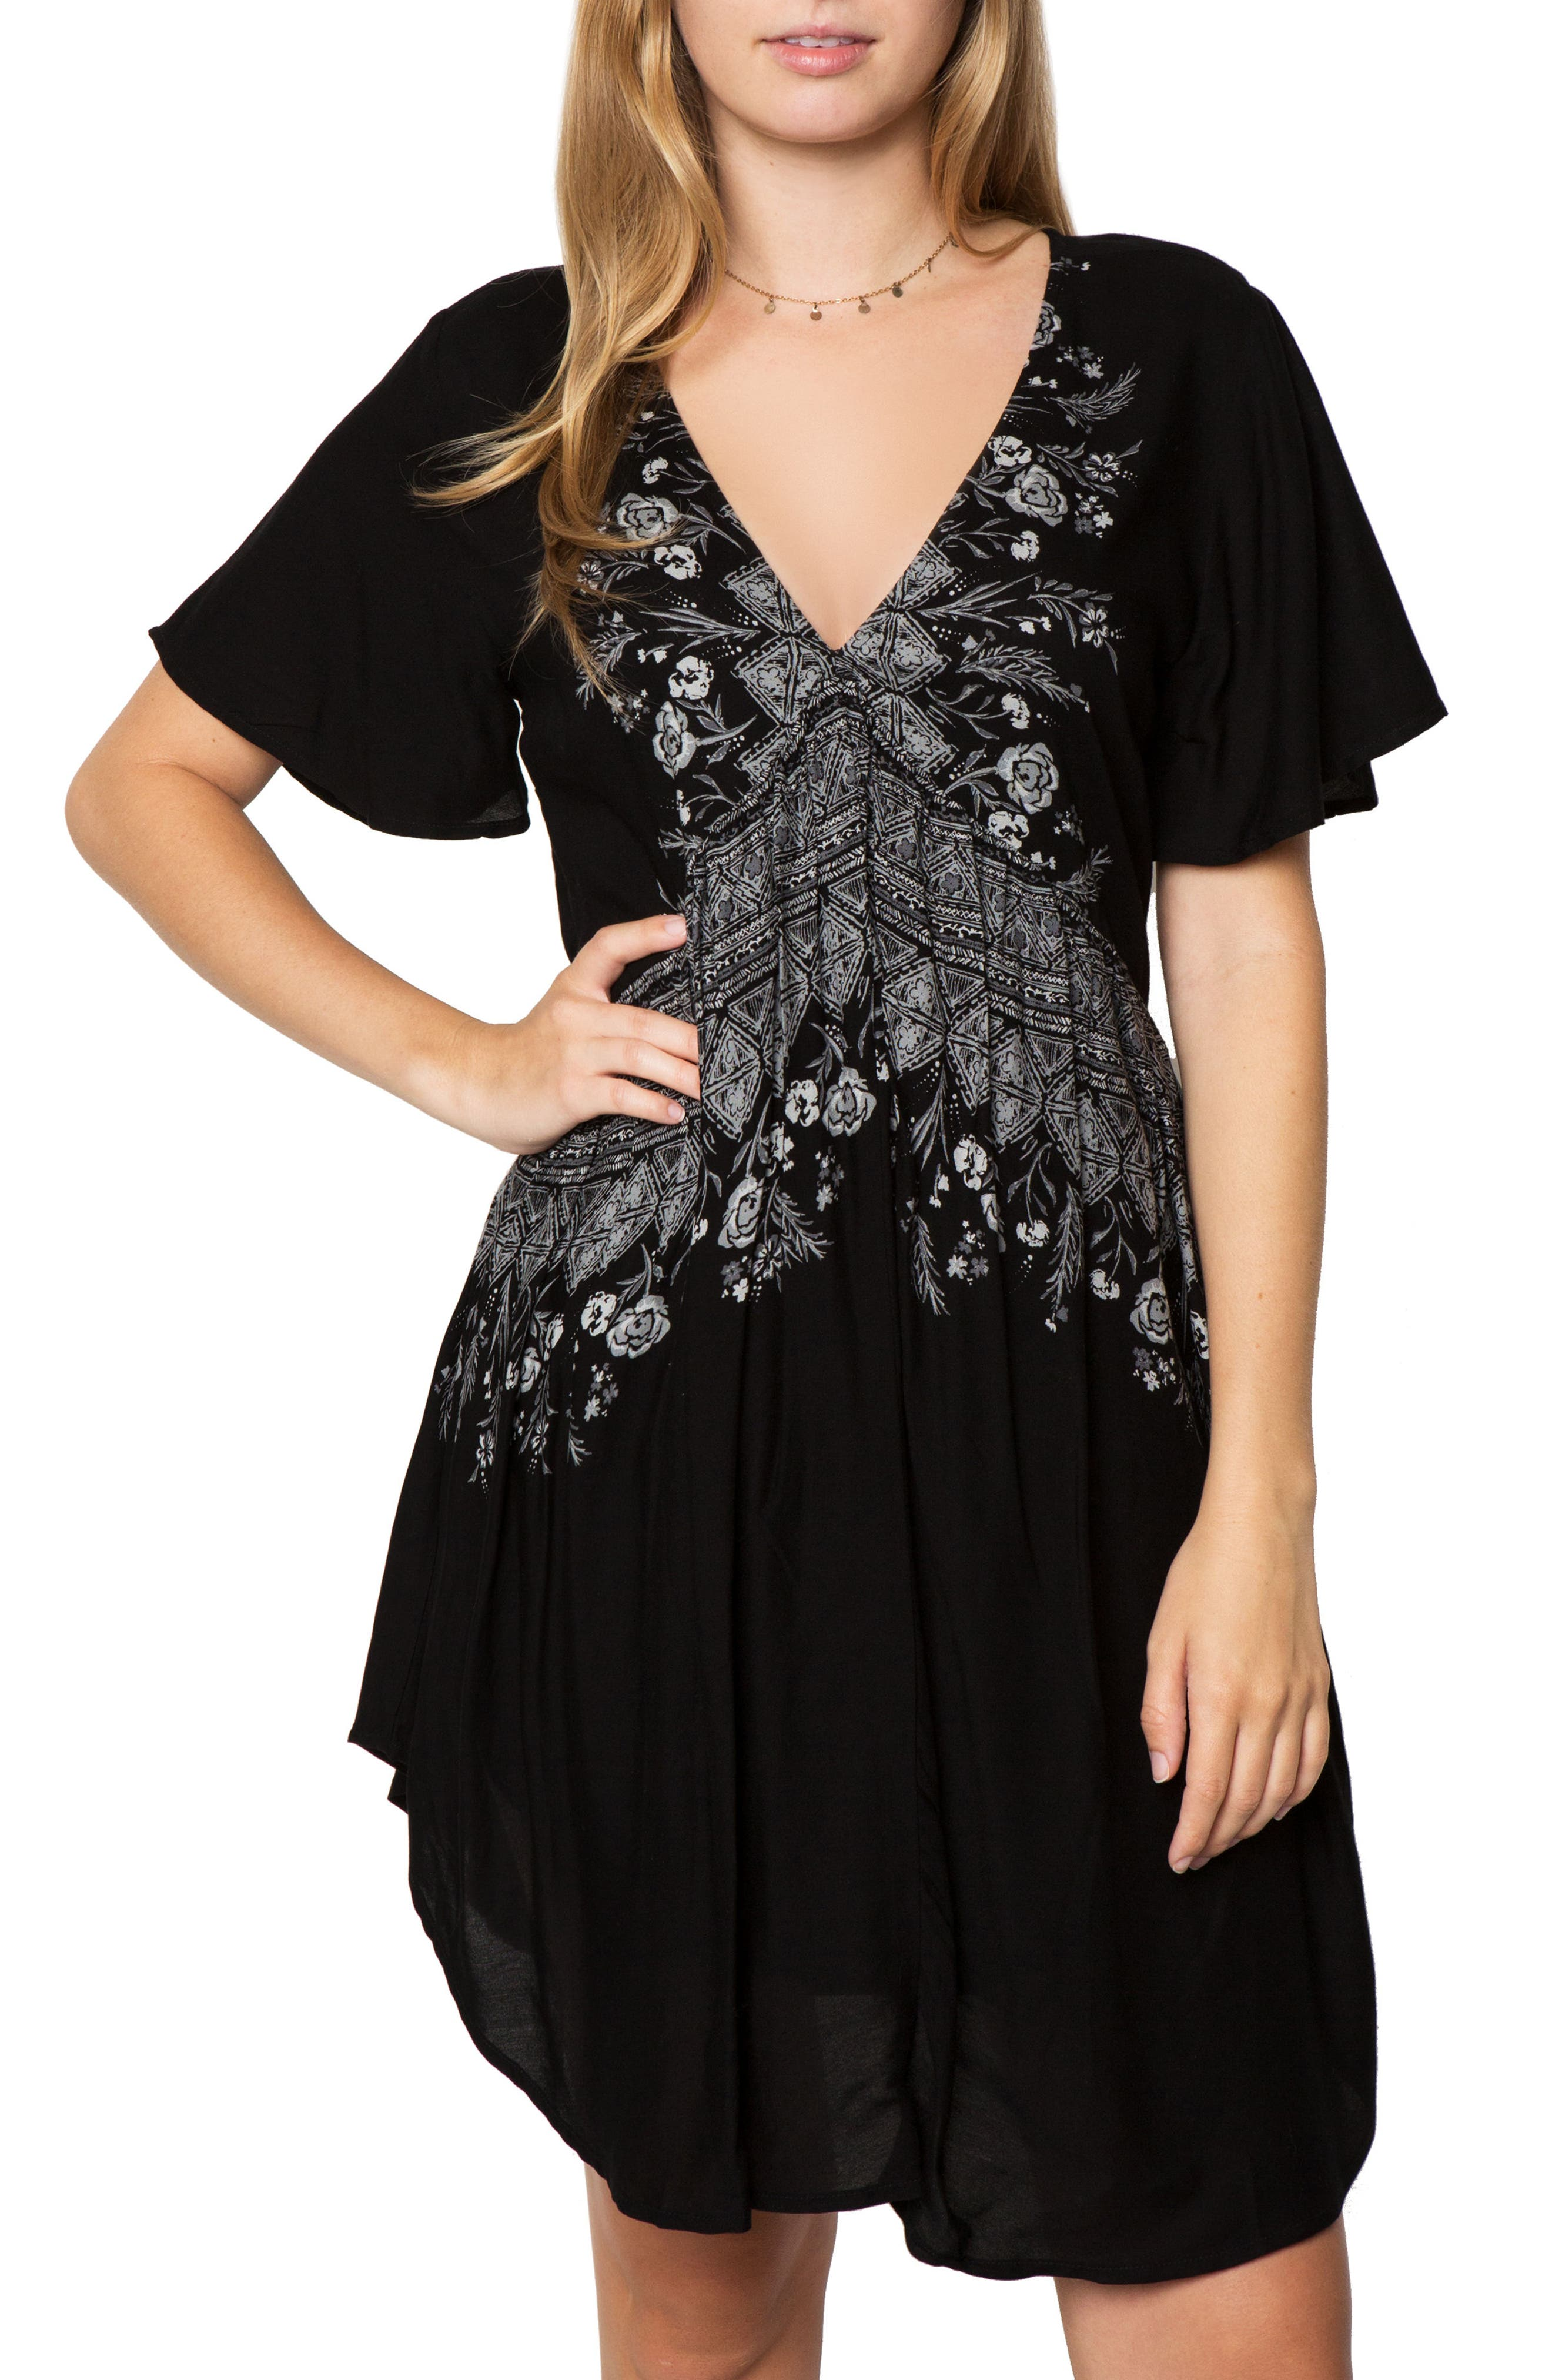 Alternate Image 1 Selected - O'Neill Clovis Print Woven Dress